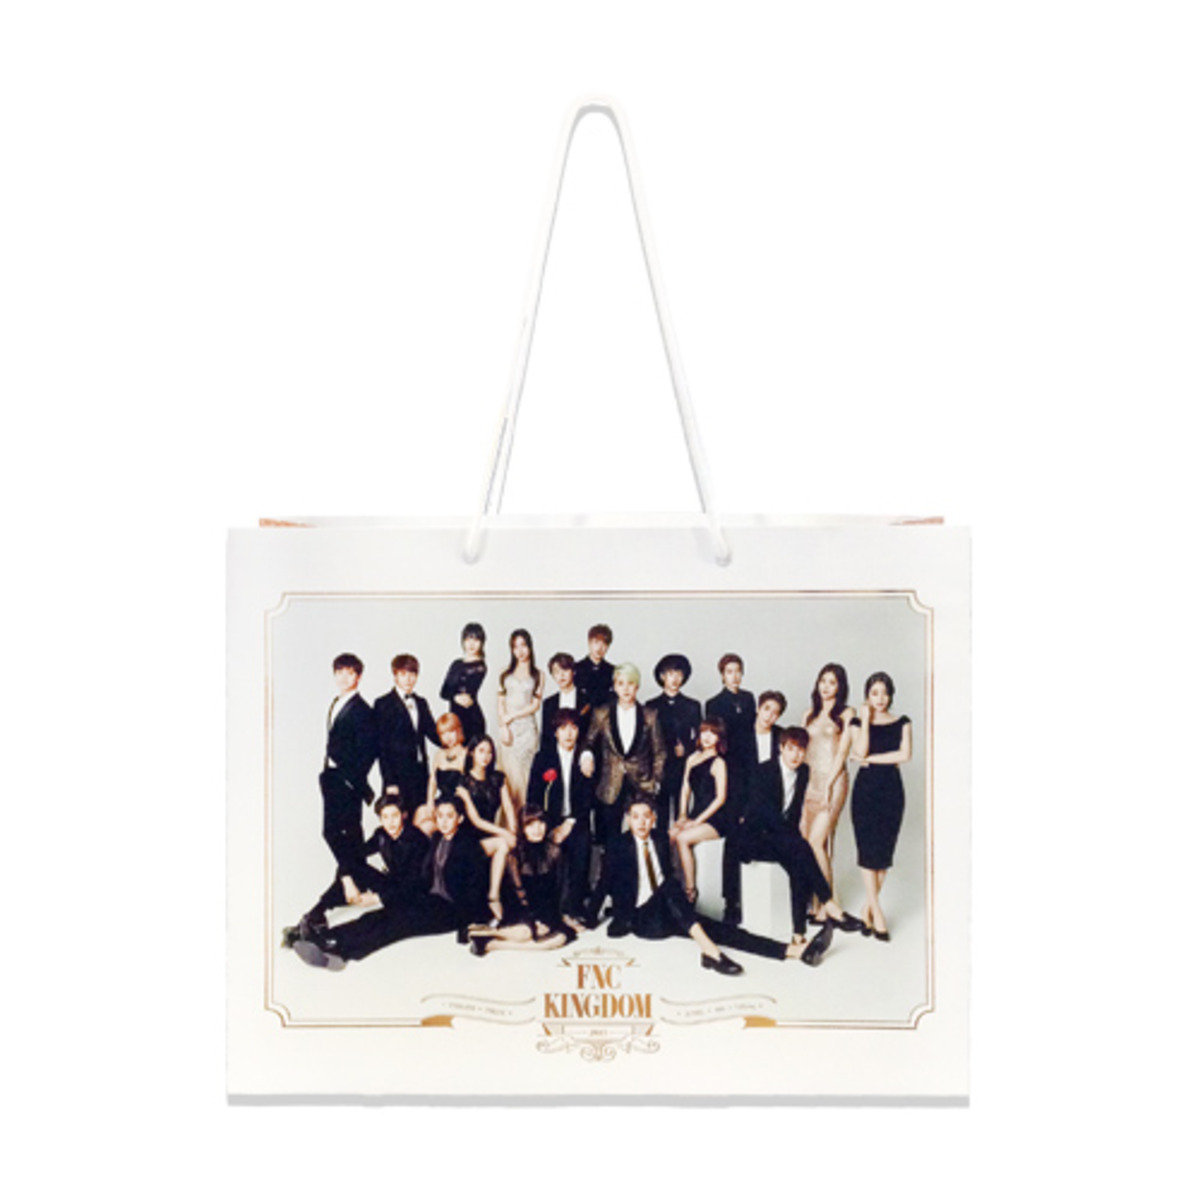 FNC KINGDOM - 購物袋_GD00019663